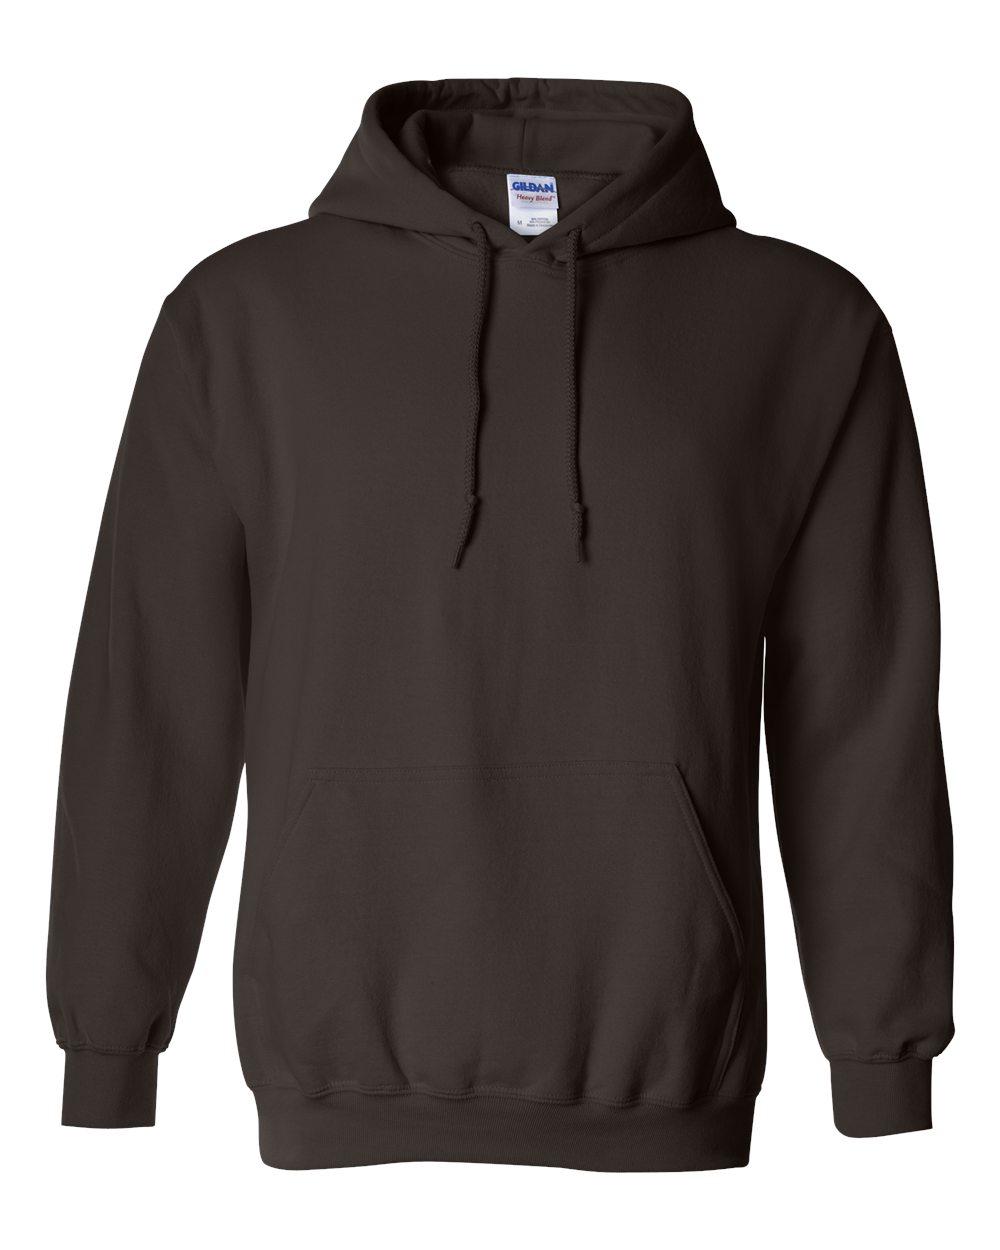 Gildan-Mens-Blank-Hoodie-Heavy-Blend-Hooded-Sweatshirt-Solid-18500-up-to-5XL thumbnail 24